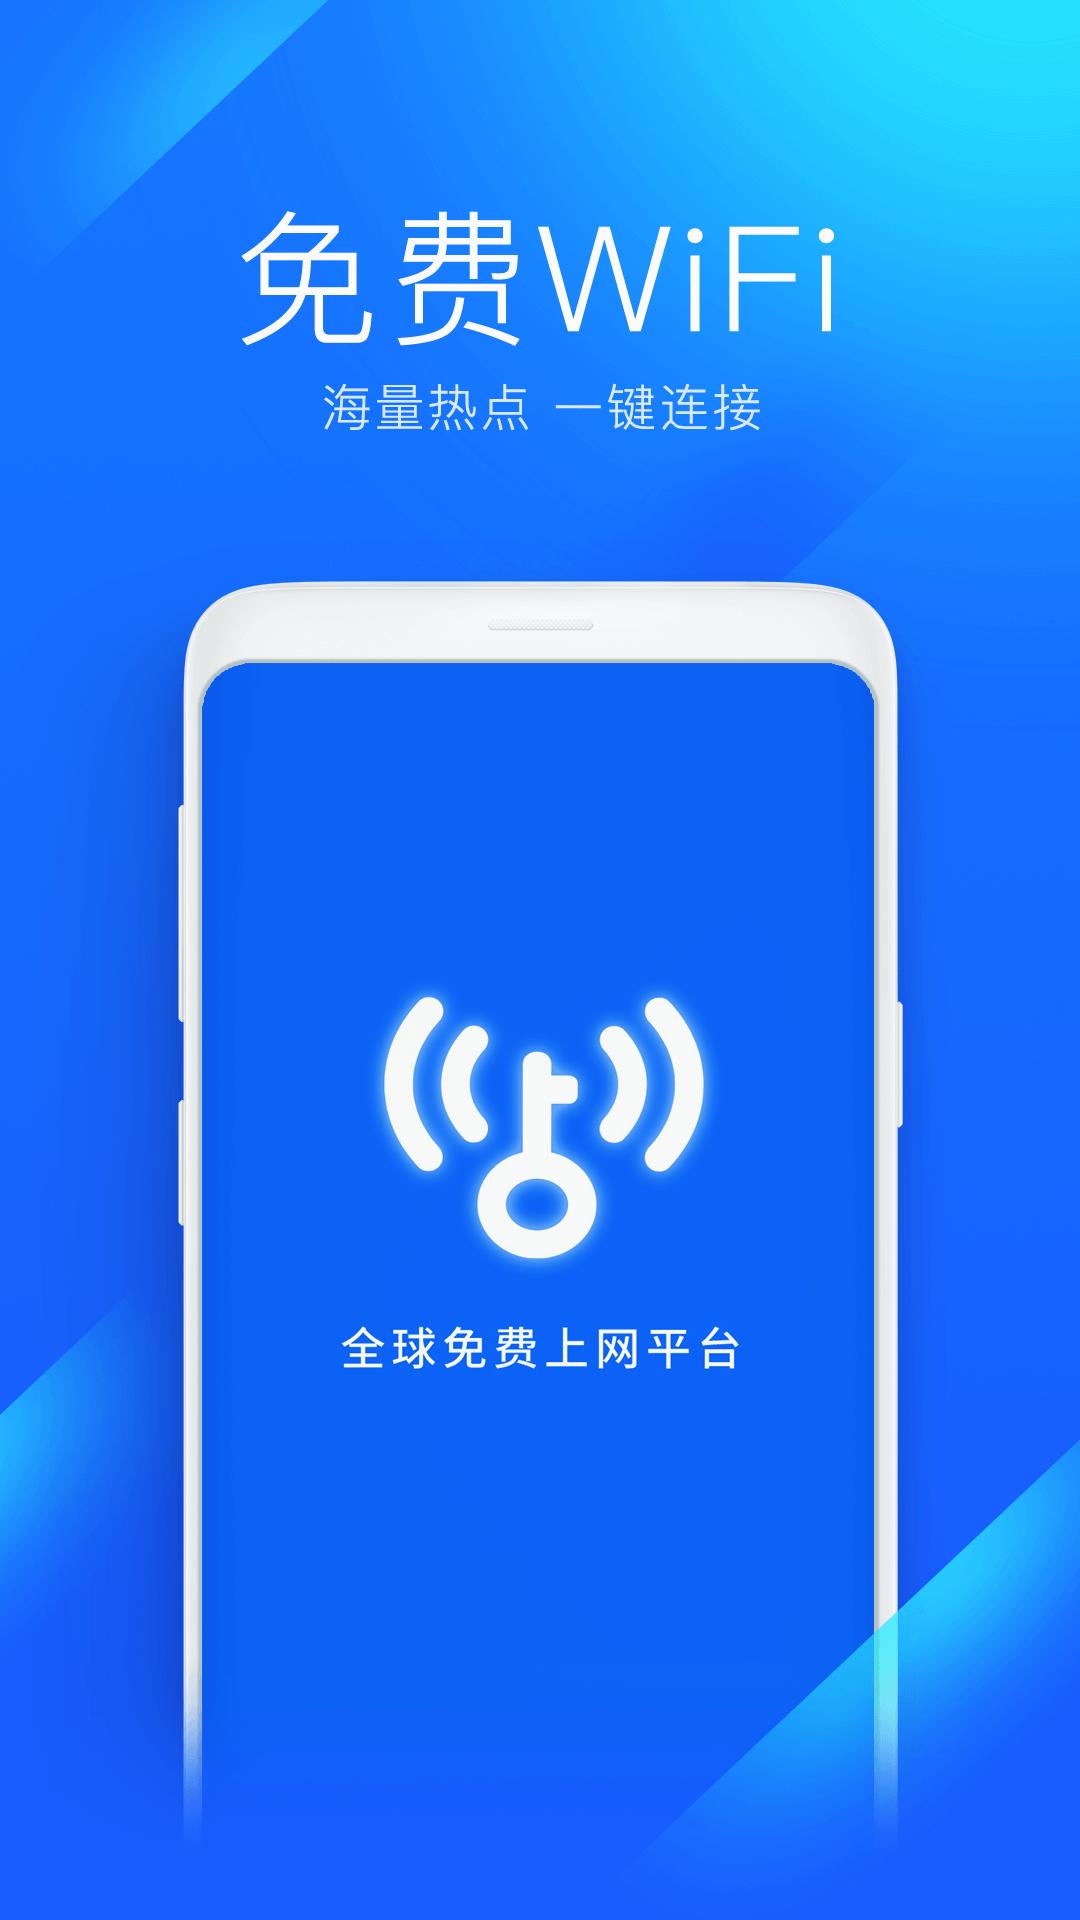 WiFi万能钥匙下载官方免费下载v4.6.62 安卓版